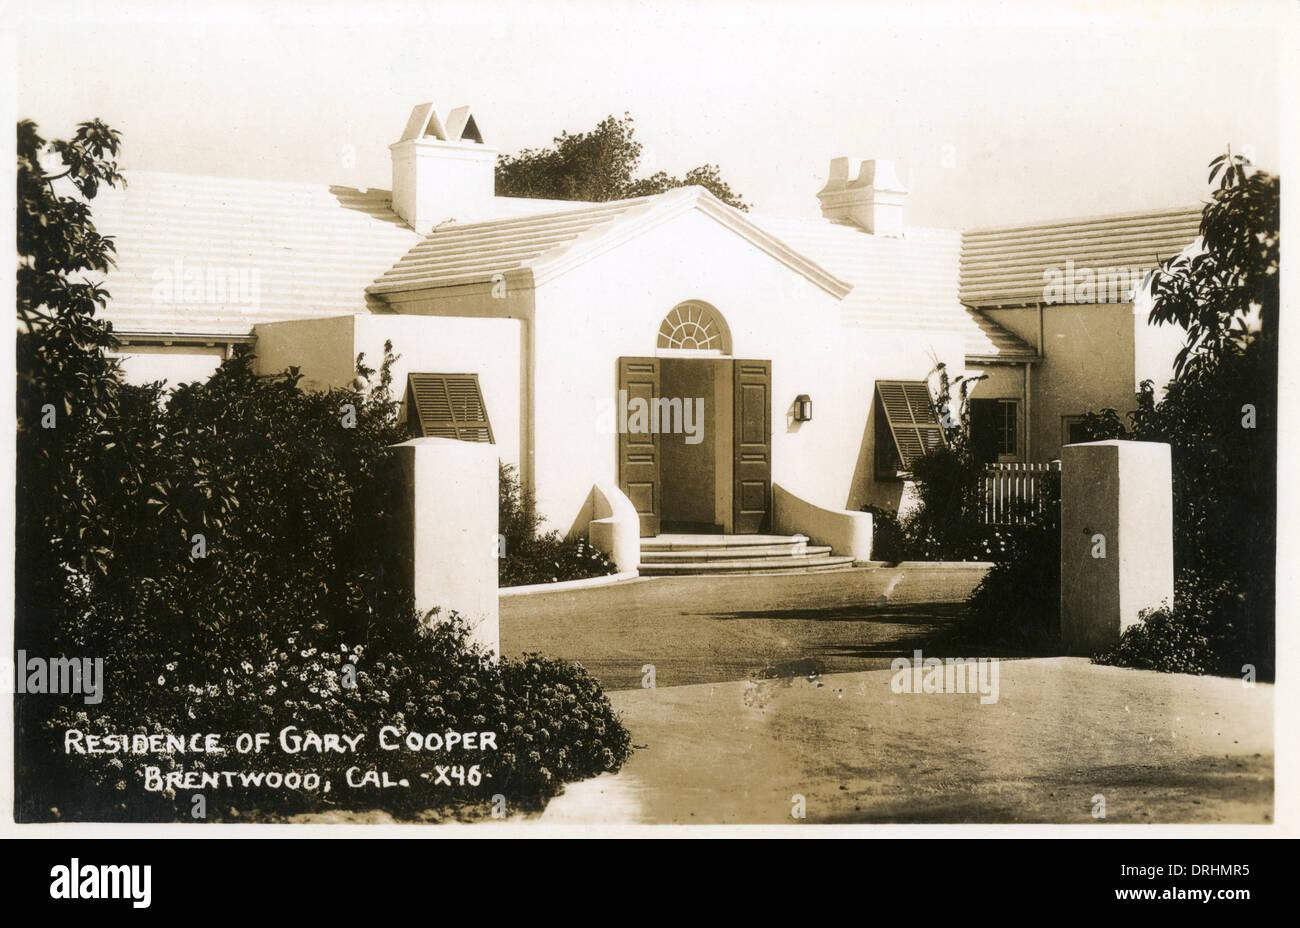 Residenz von Gary Cooper, Brentwood, Kalifornien, USA Stockbild